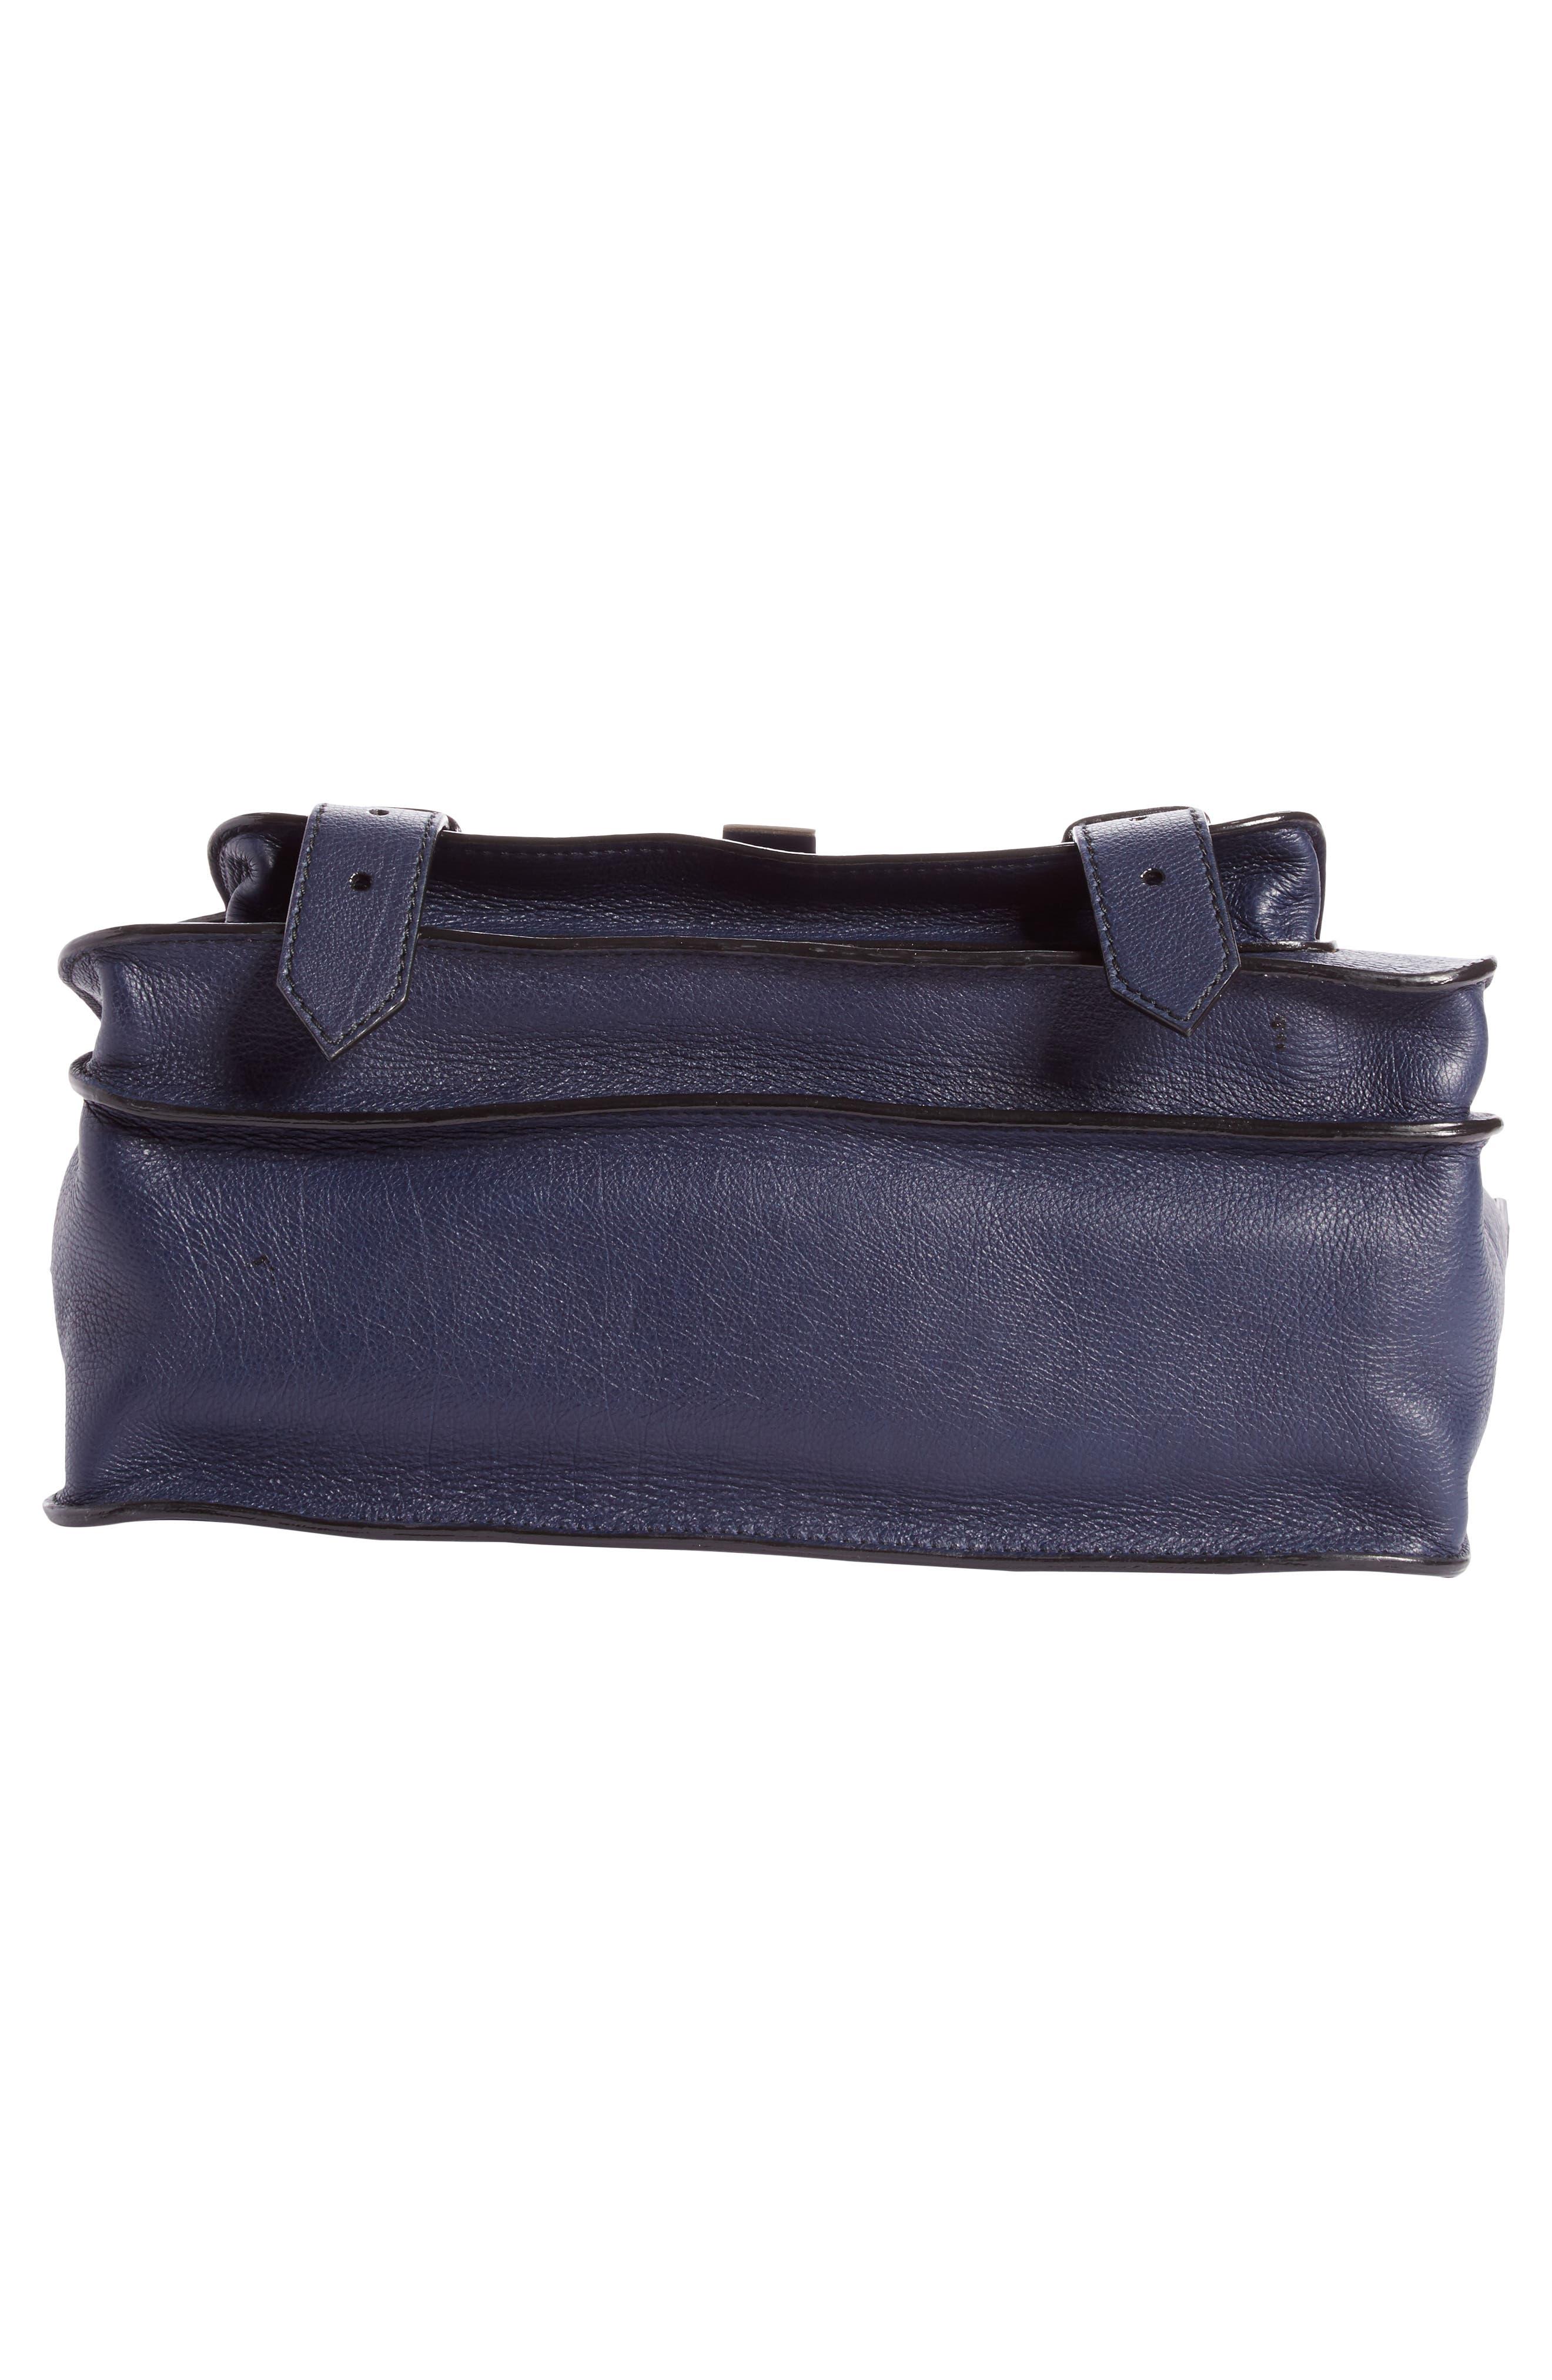 Medium PS1+ Grainy Leather Satchel,                             Alternate thumbnail 5, color,                             INDIGO